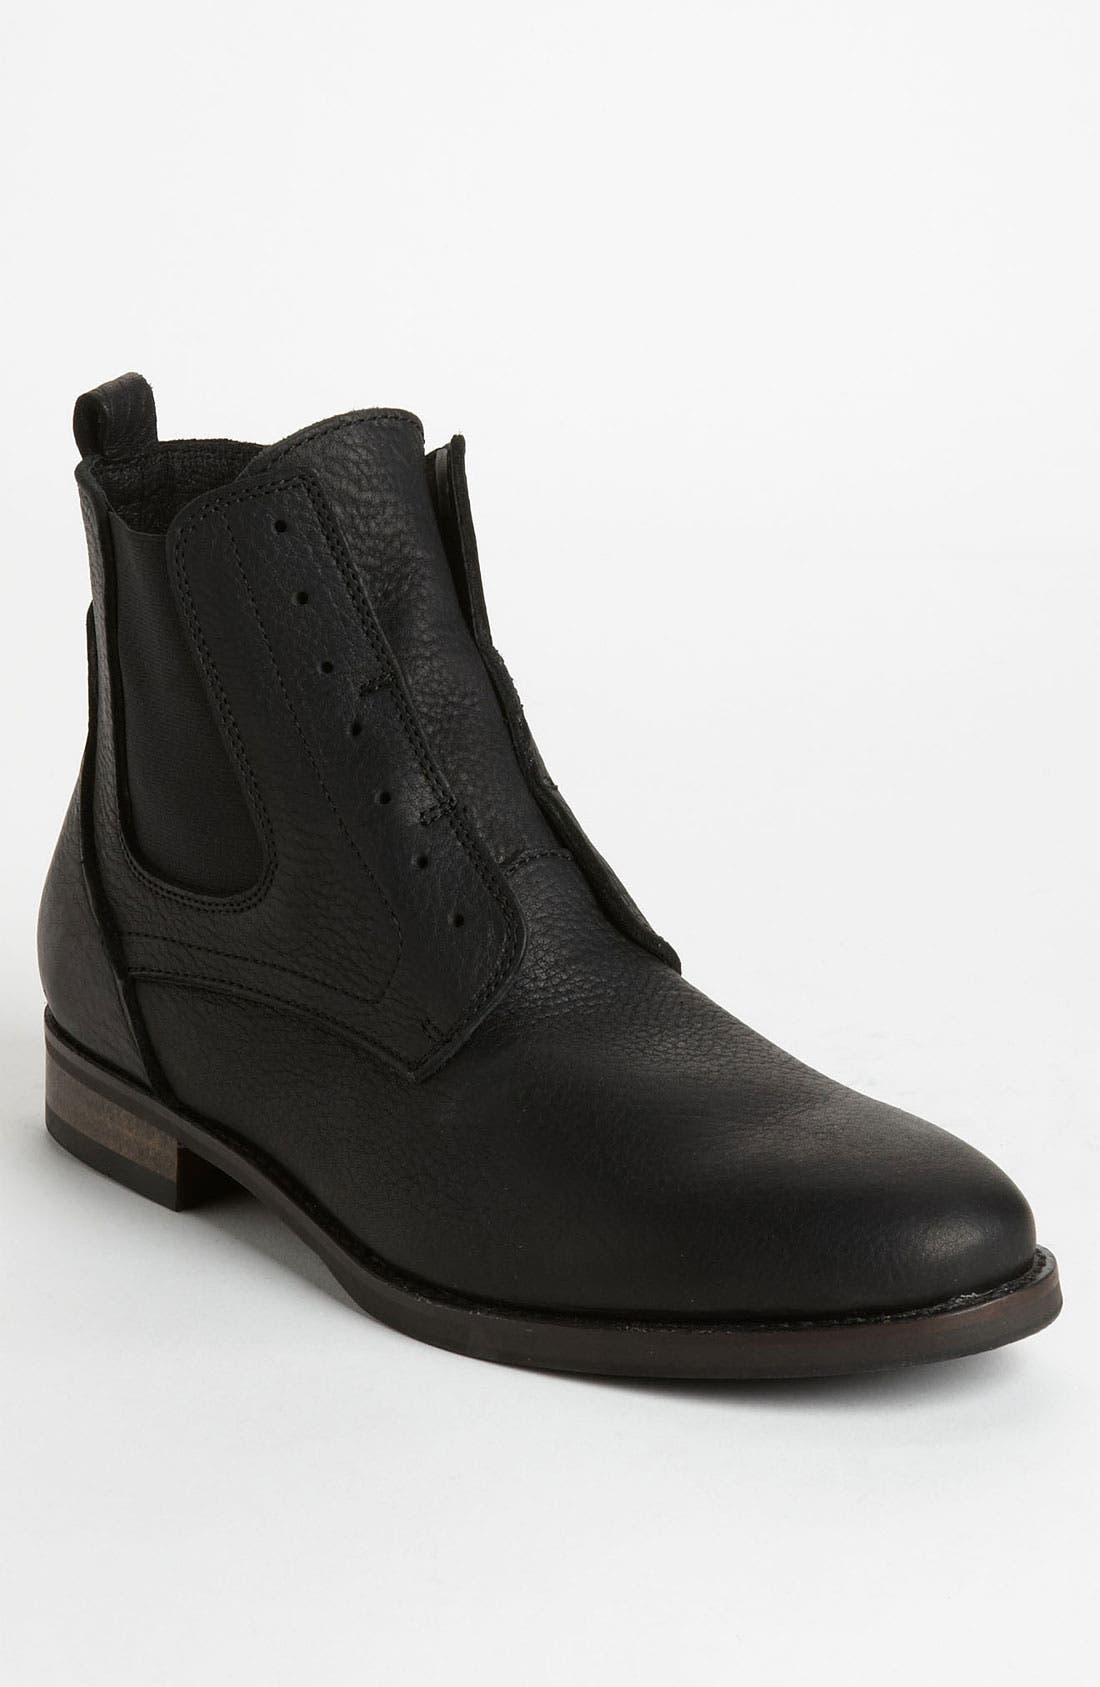 Main Image - J.D. Fisk 'Mathers' Boot